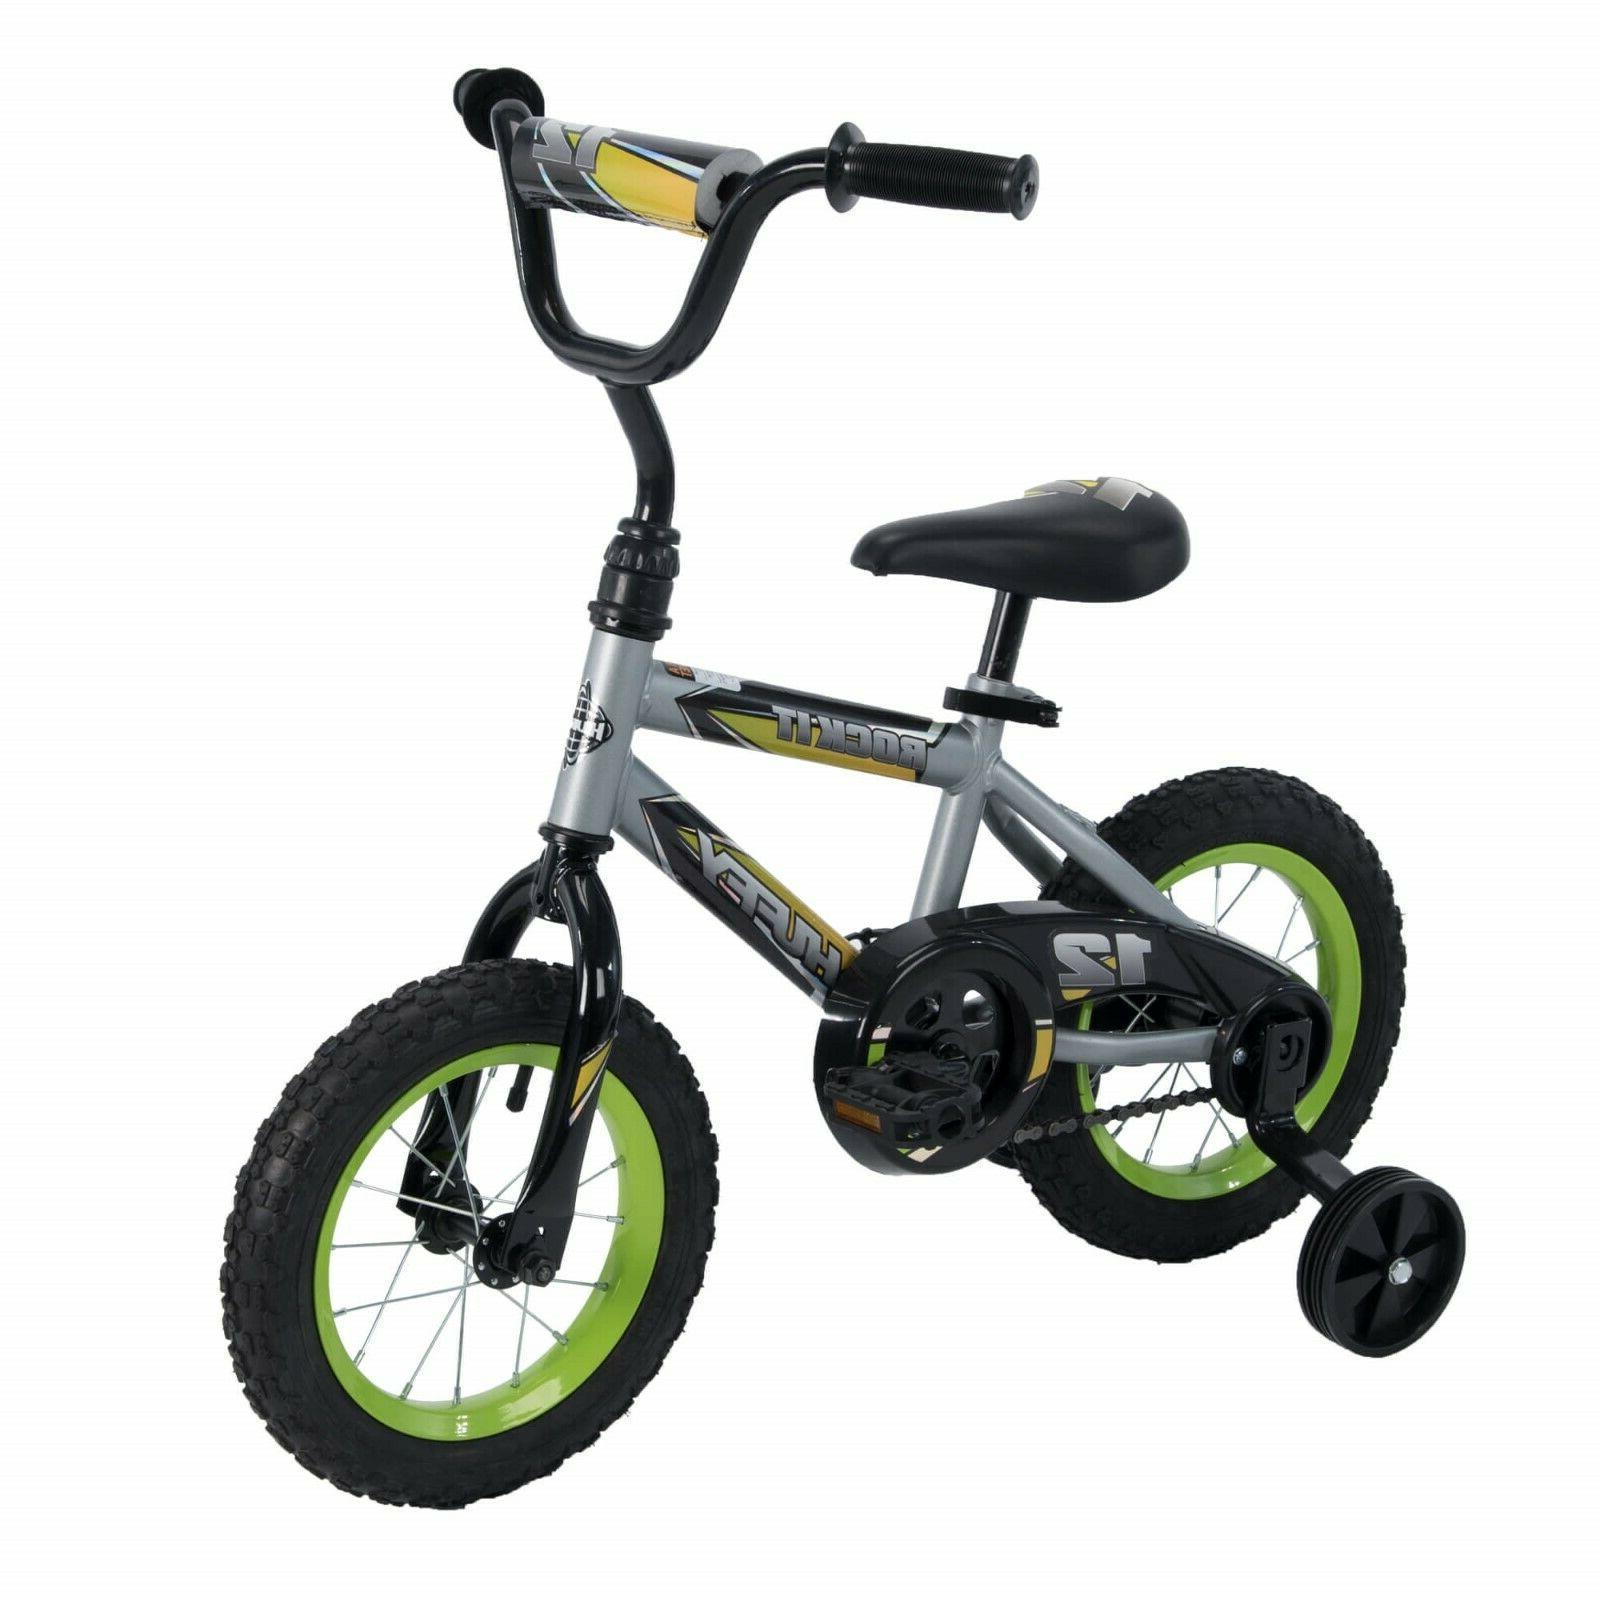 "12"" Boys Rock It Bike Bicycle Kids Single Speed Bike Coaster"